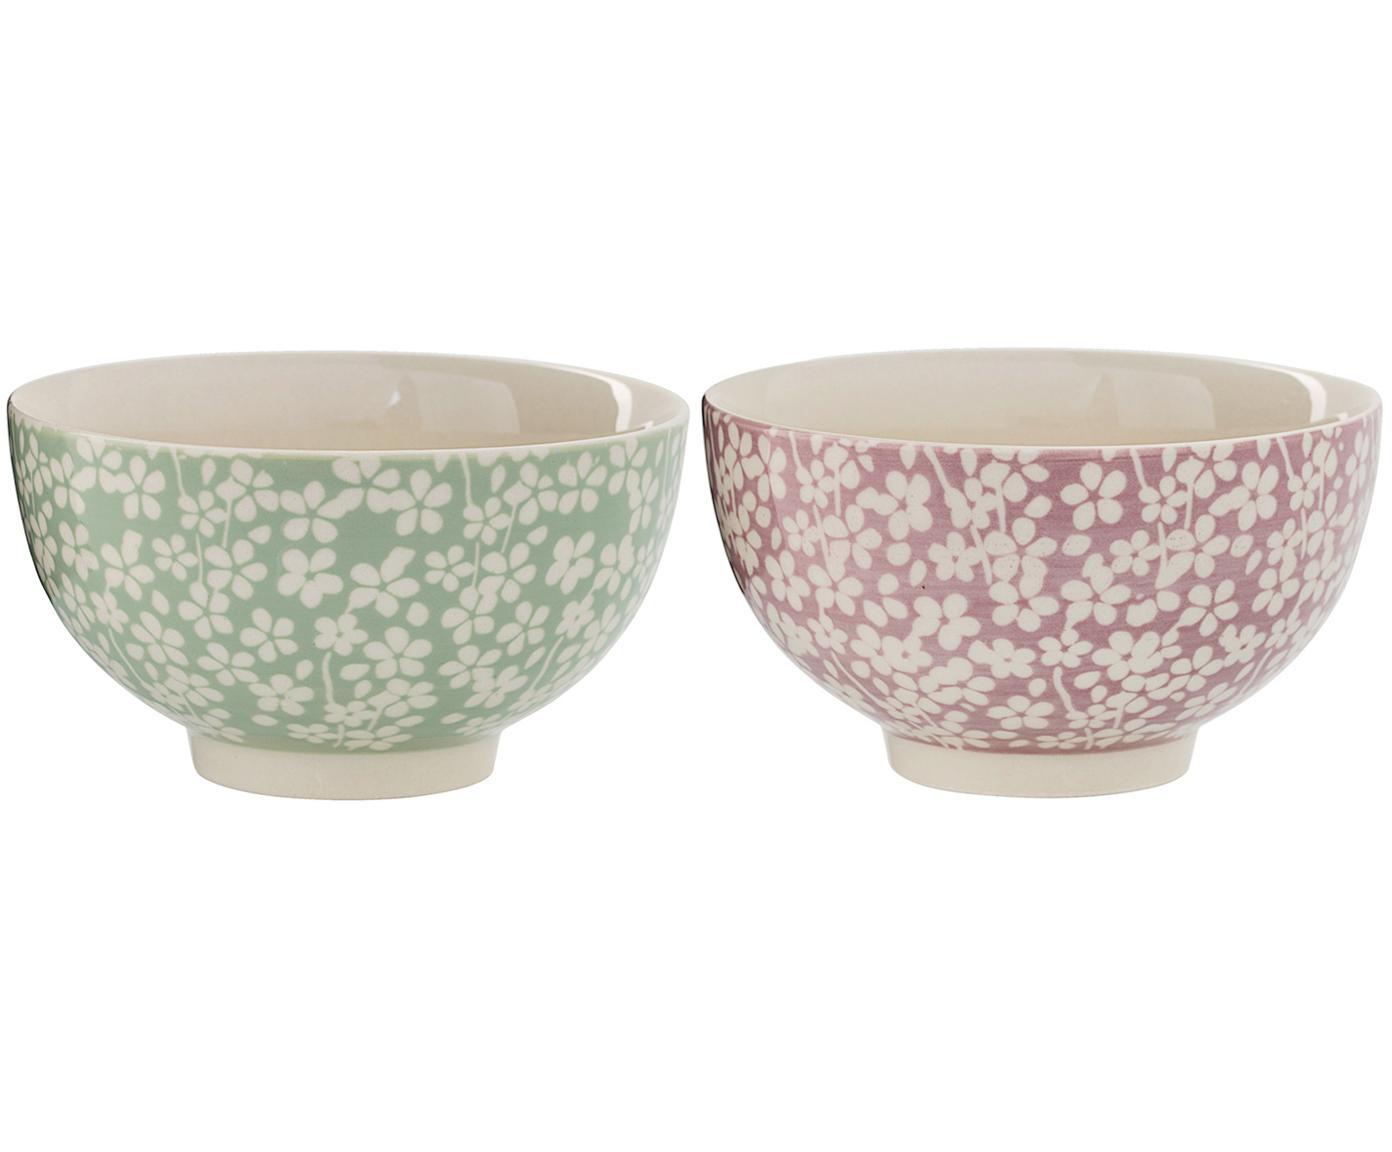 Schälchen-Set Seeke, 2-tlg., Keramik, Mauve, Lorbeer, Creme, Ø 14 x H 8 cm